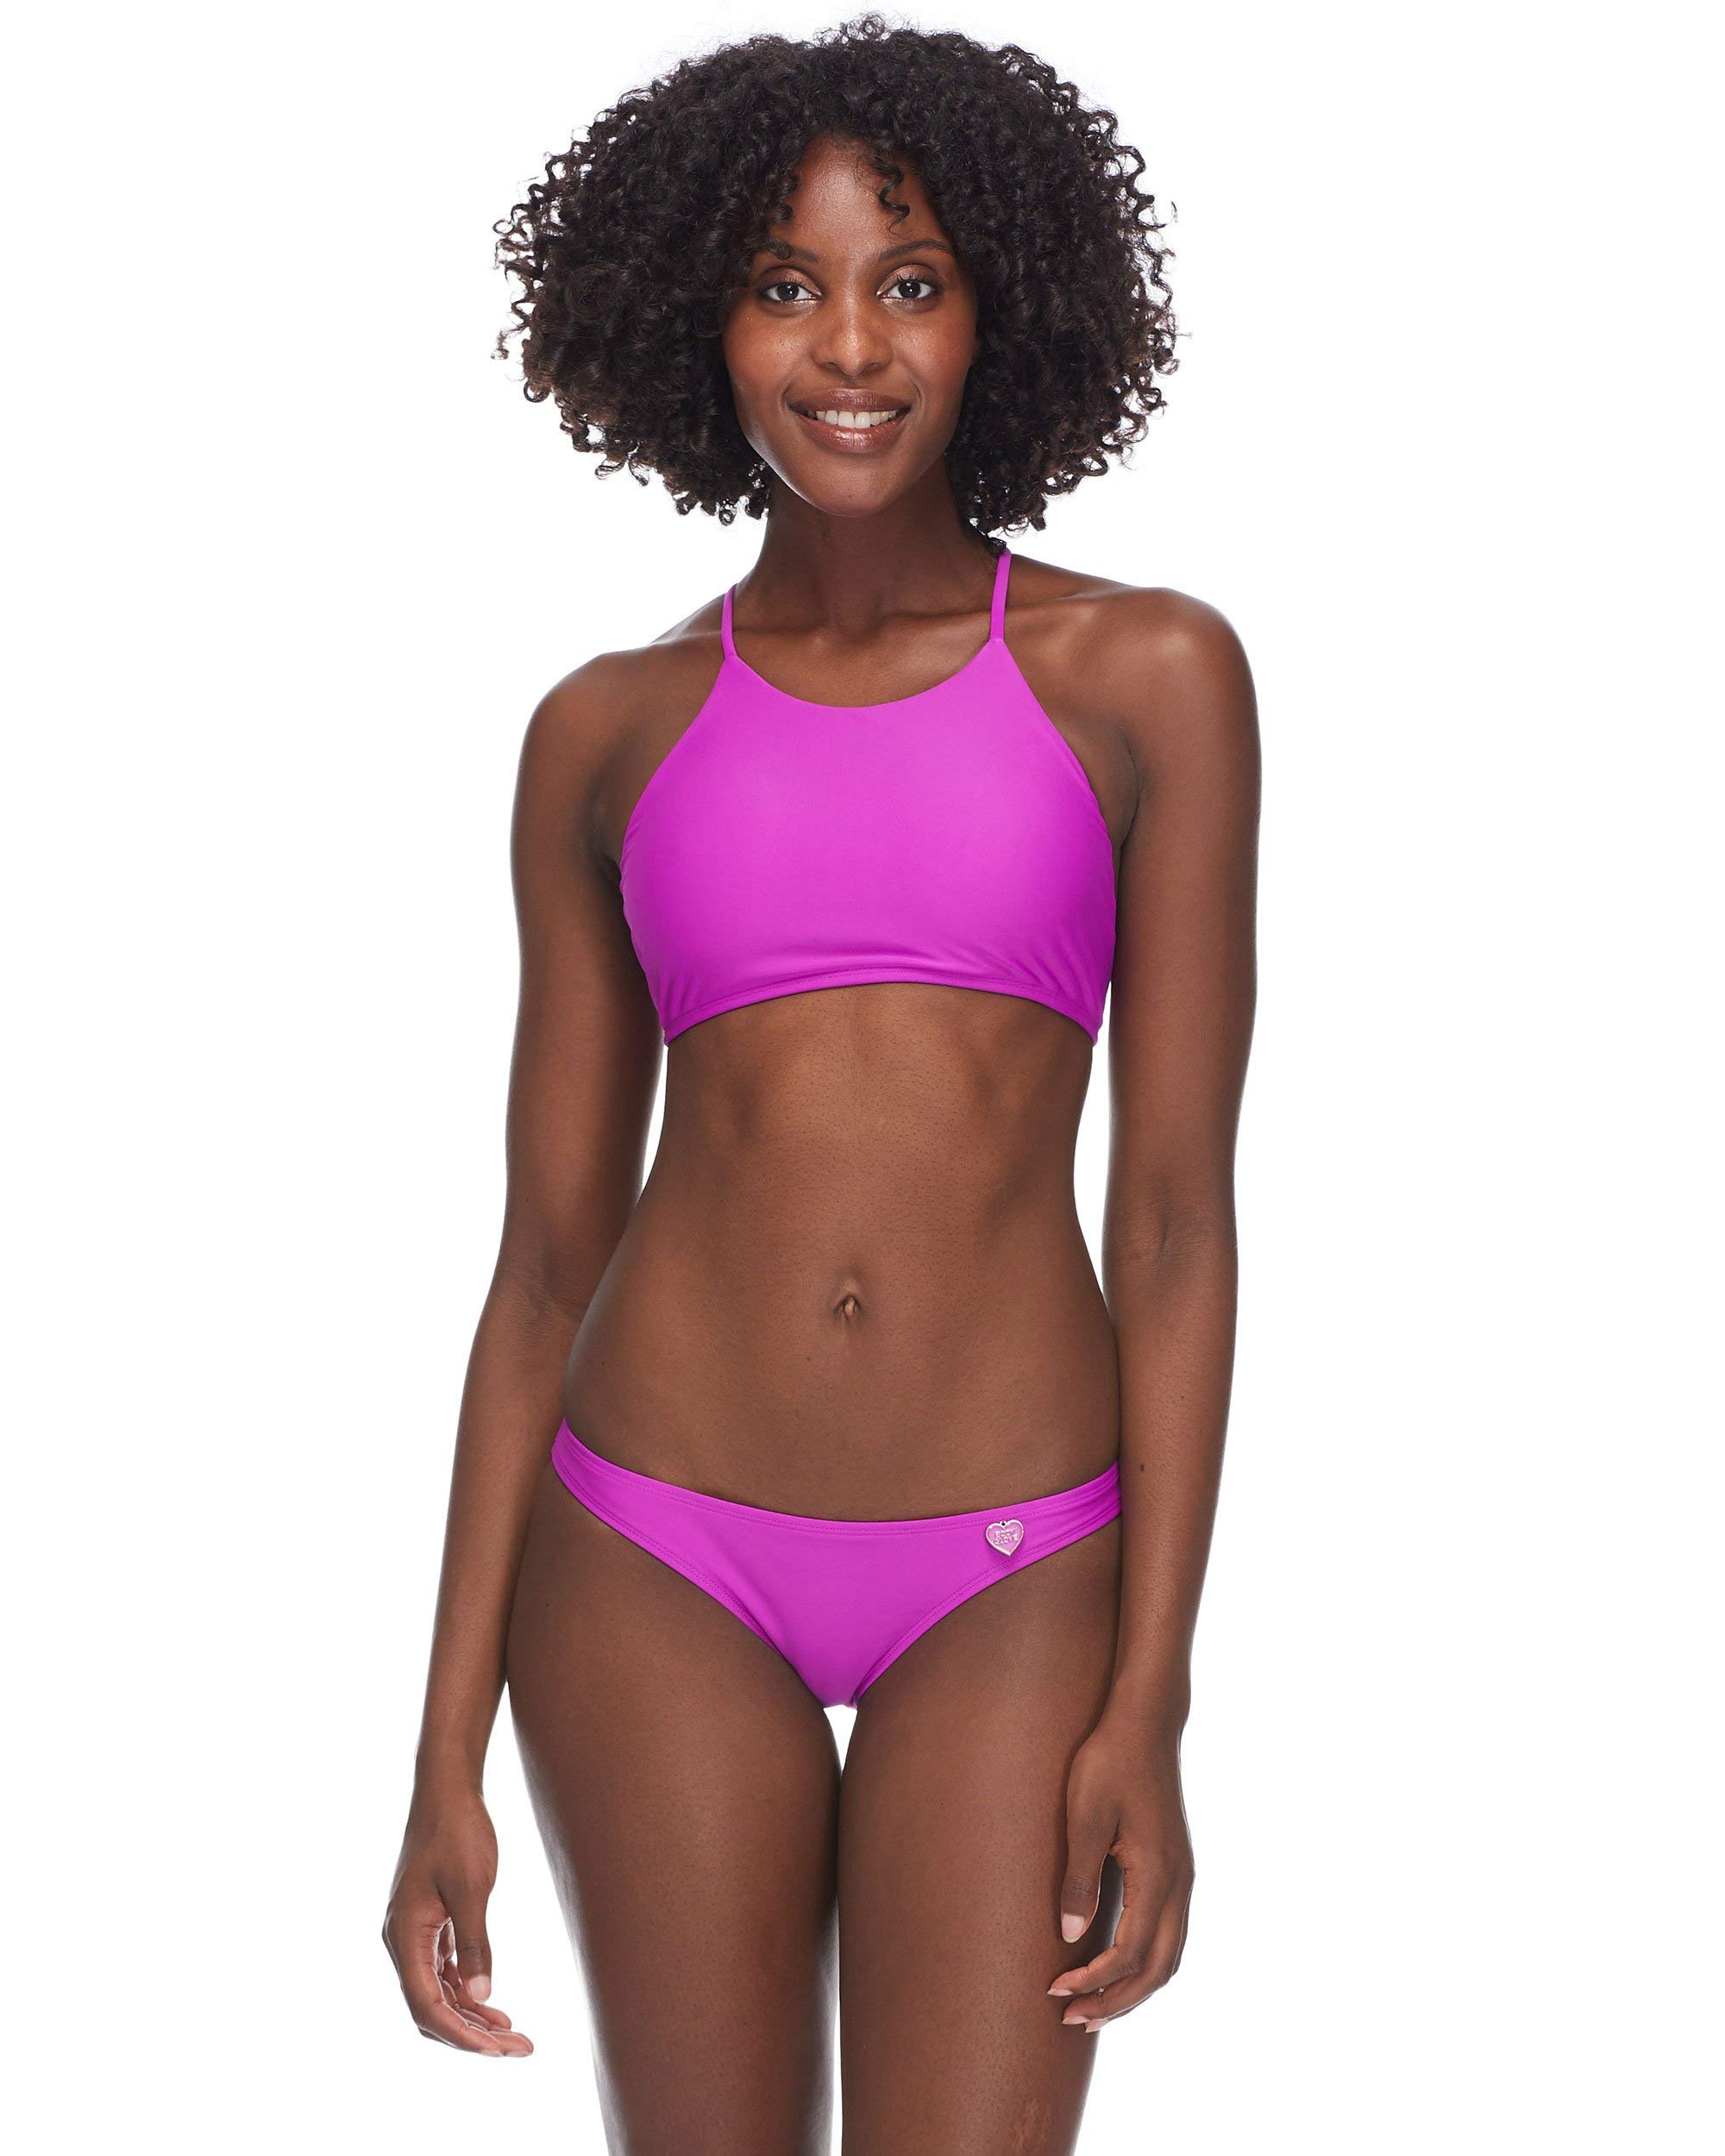 Body Glove Women's Smoothies Elena Solid High Neck Crop Bikini Top Swimsuit, Magnolia, Large